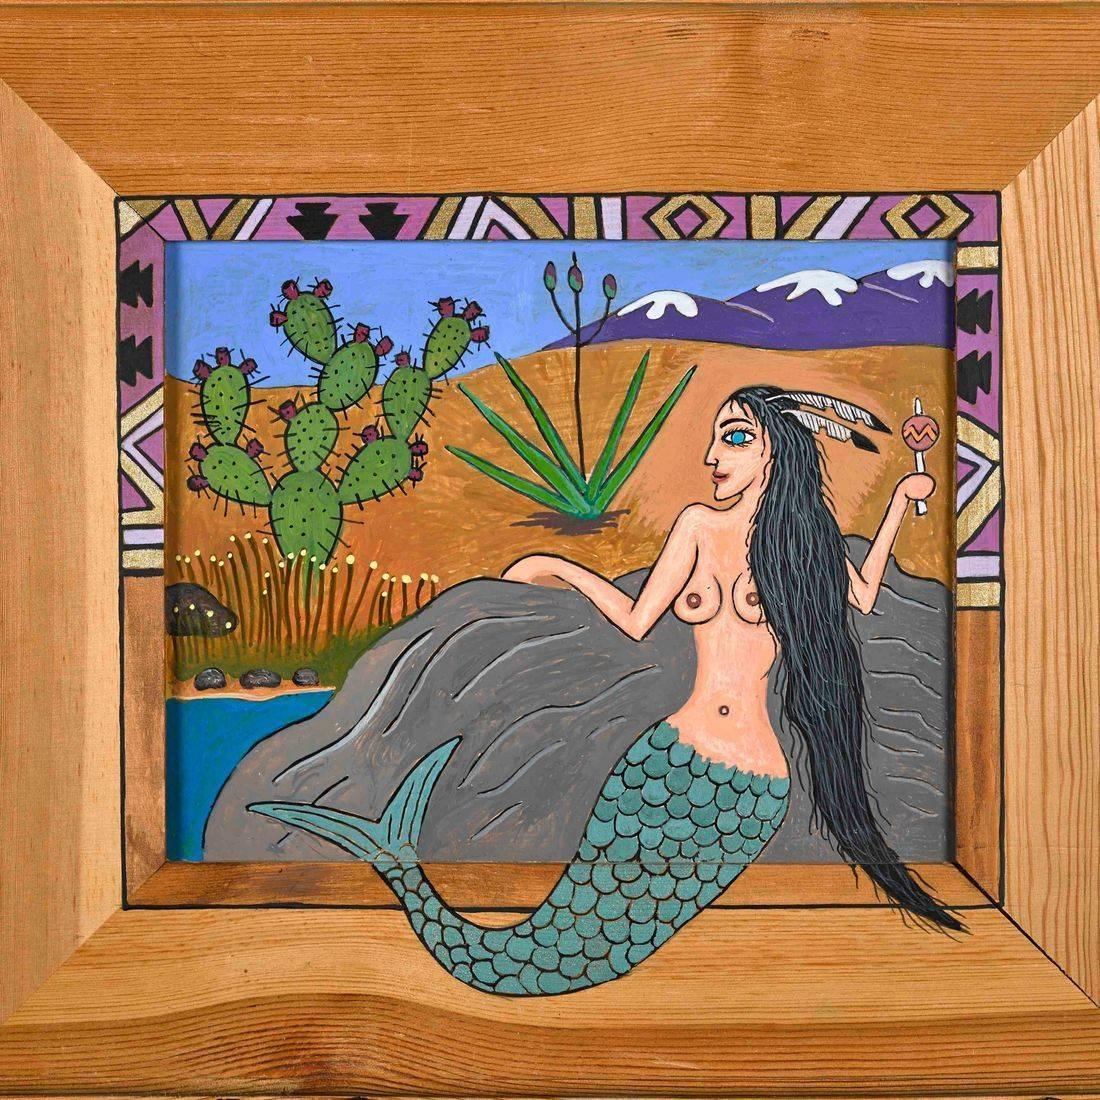 Mermaid, Arroyo, Saguaro, Cactus, Desert, Sexy Woman, Femme Fatale, Feather Headdress